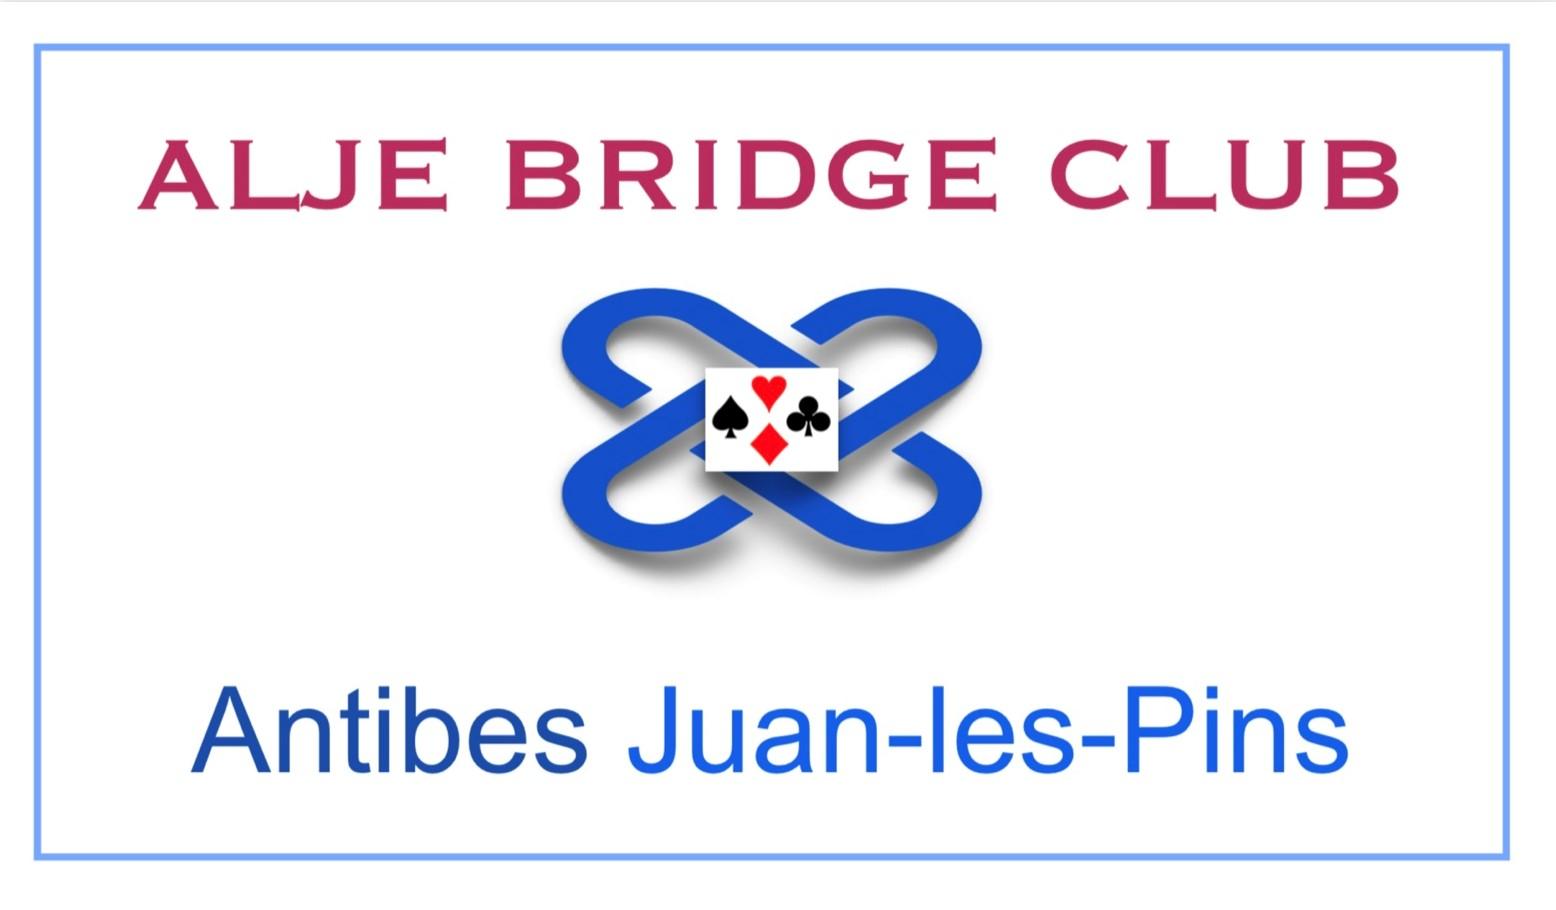 ALJE-BRIDGE-JUANLESPINS